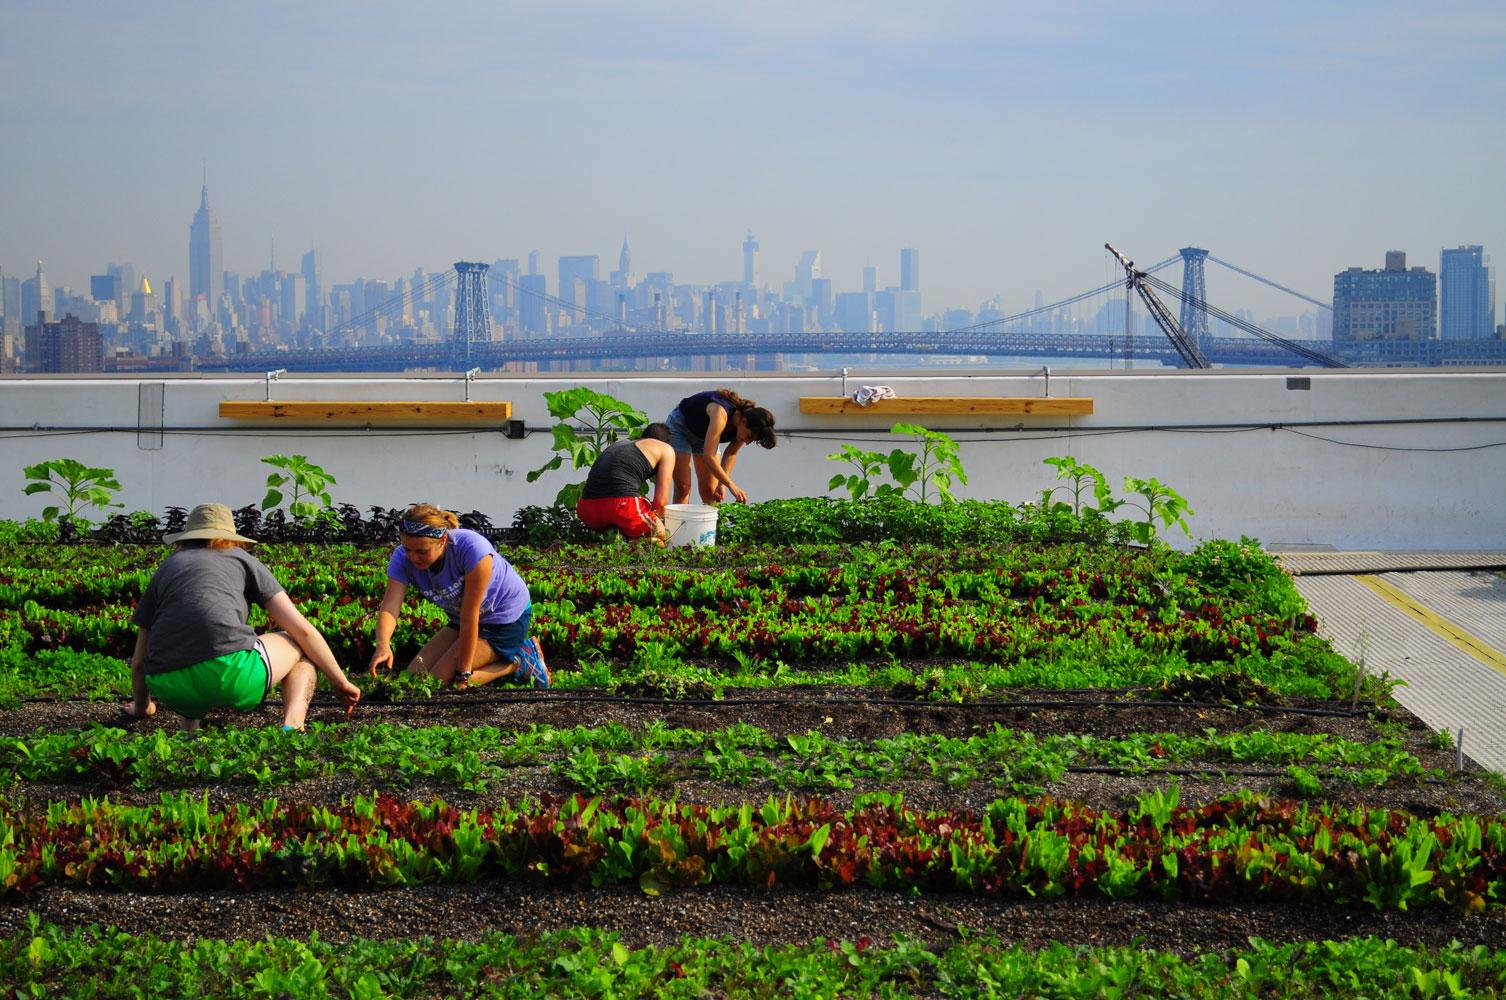 Brooklyn Grange, theLargest Rooftop Soil Farm